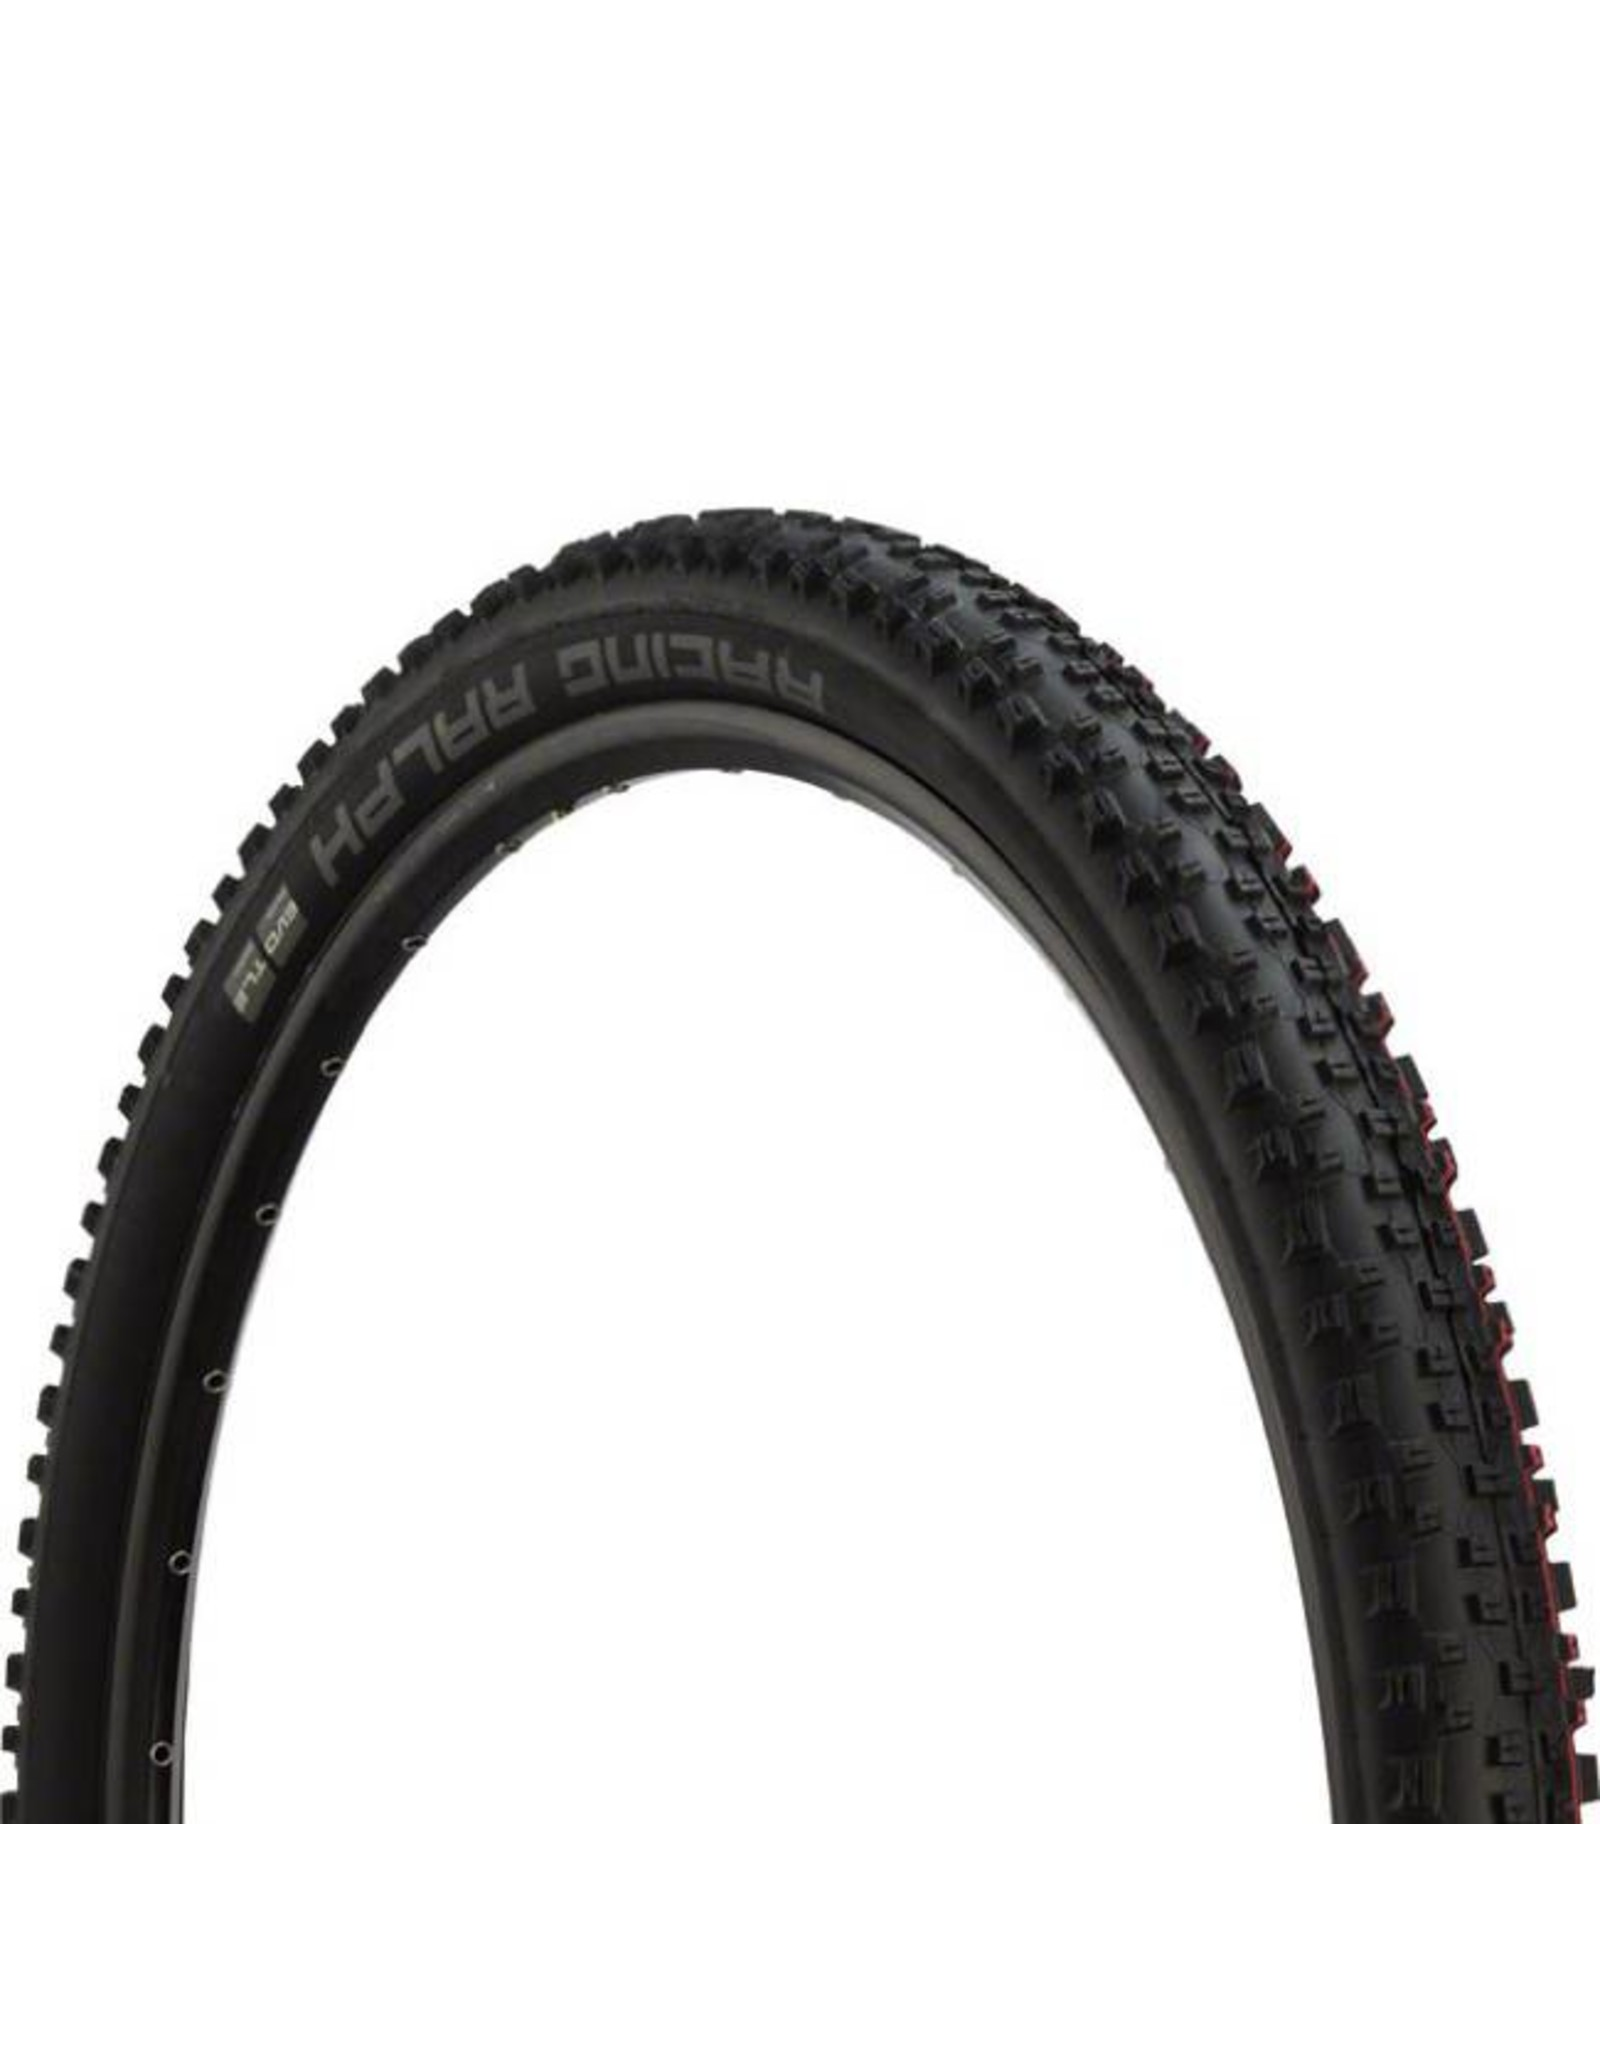 "Schwalbe Schwalbe Racing Ralph Tire: 27.5 x 2.25"", Folding Bead, Evolution Line, Addix Speed Compound, SnakeSkin, Tubeless Easy, Black"